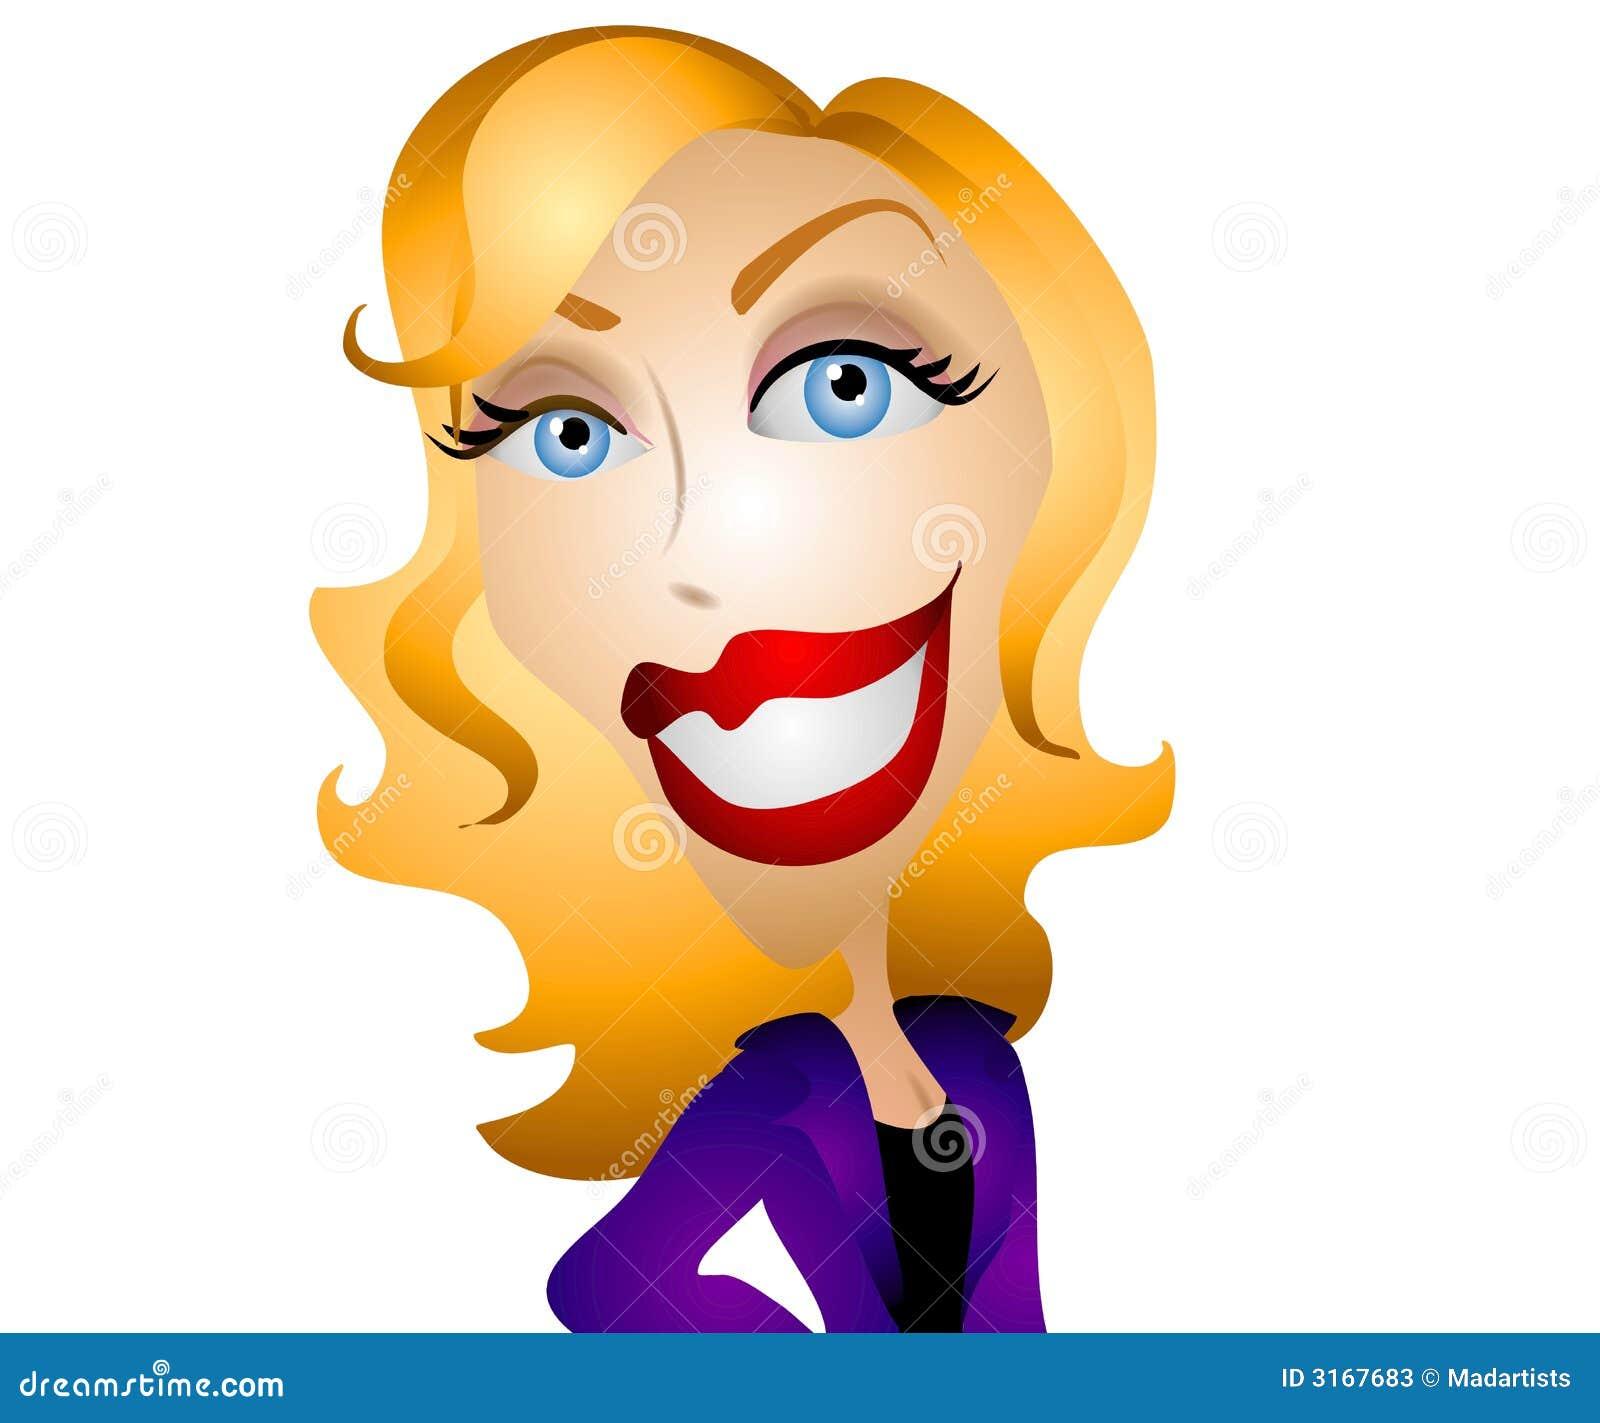 Happy Cartoon Woman 2 Stock Photos - Image: 3167683